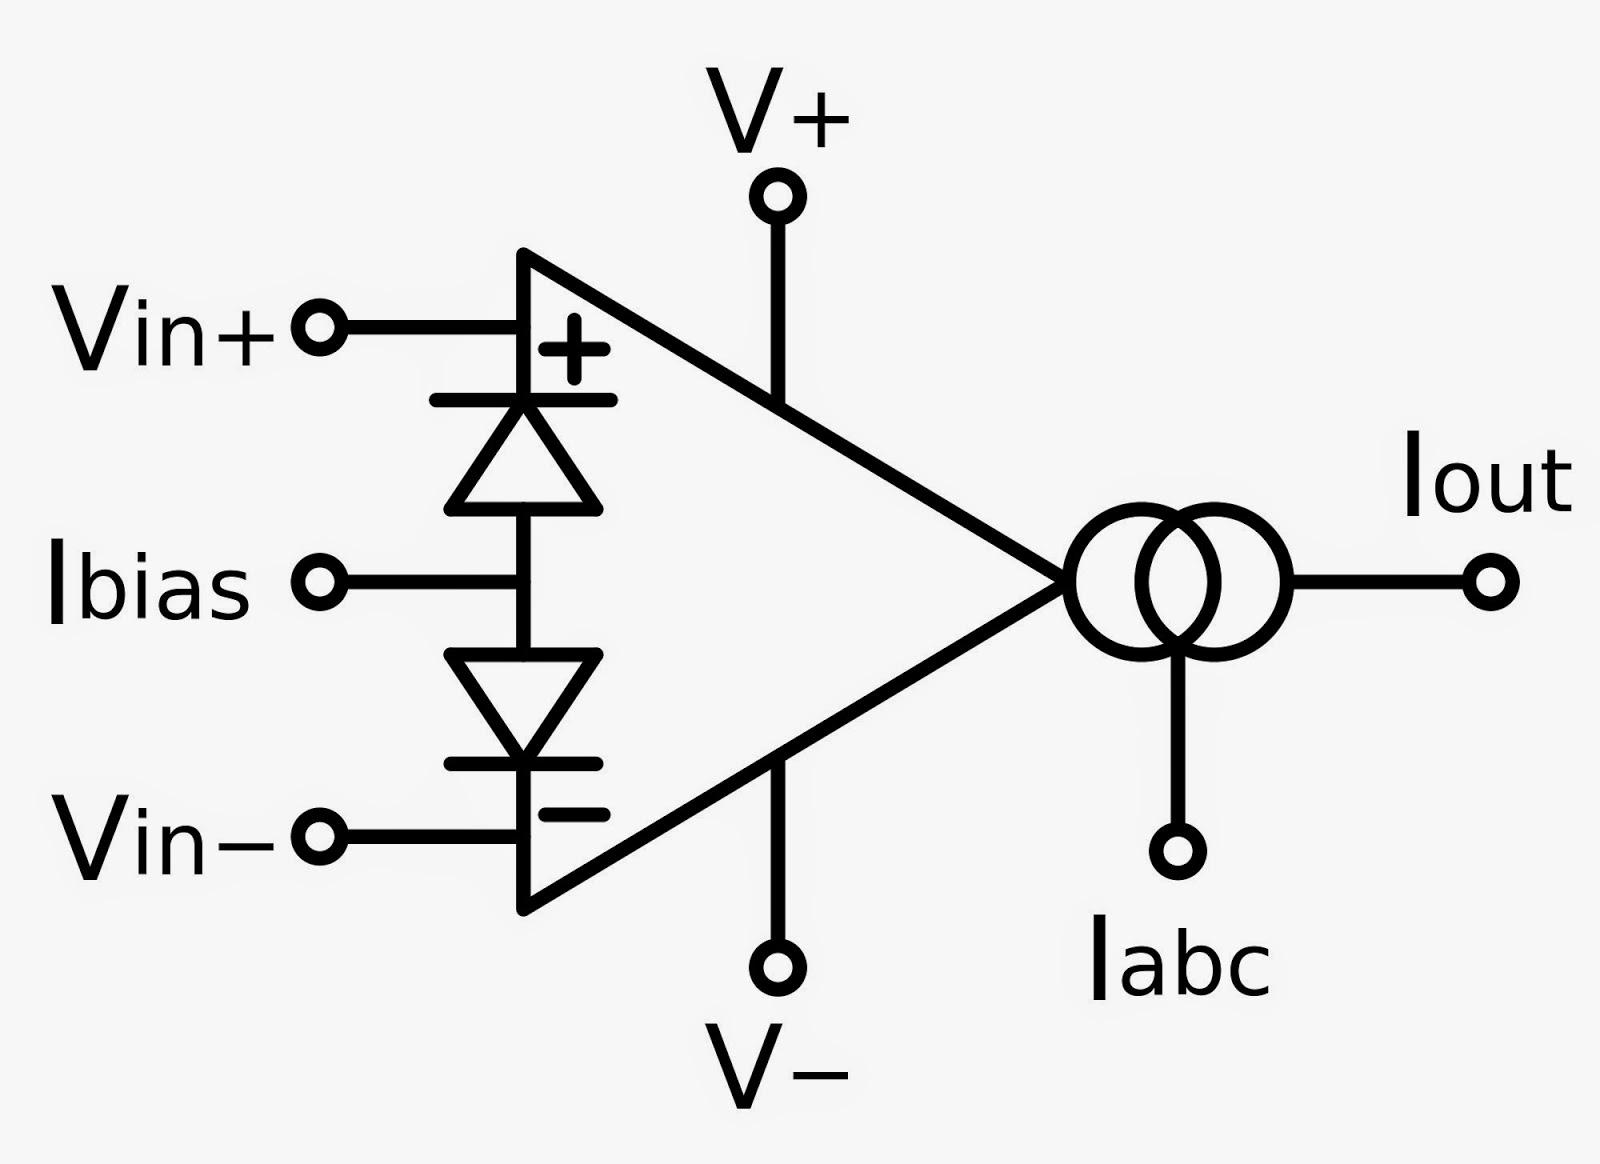 JonDent - Exploring Electronic Music: NonLinear Circuits - Dual OTA